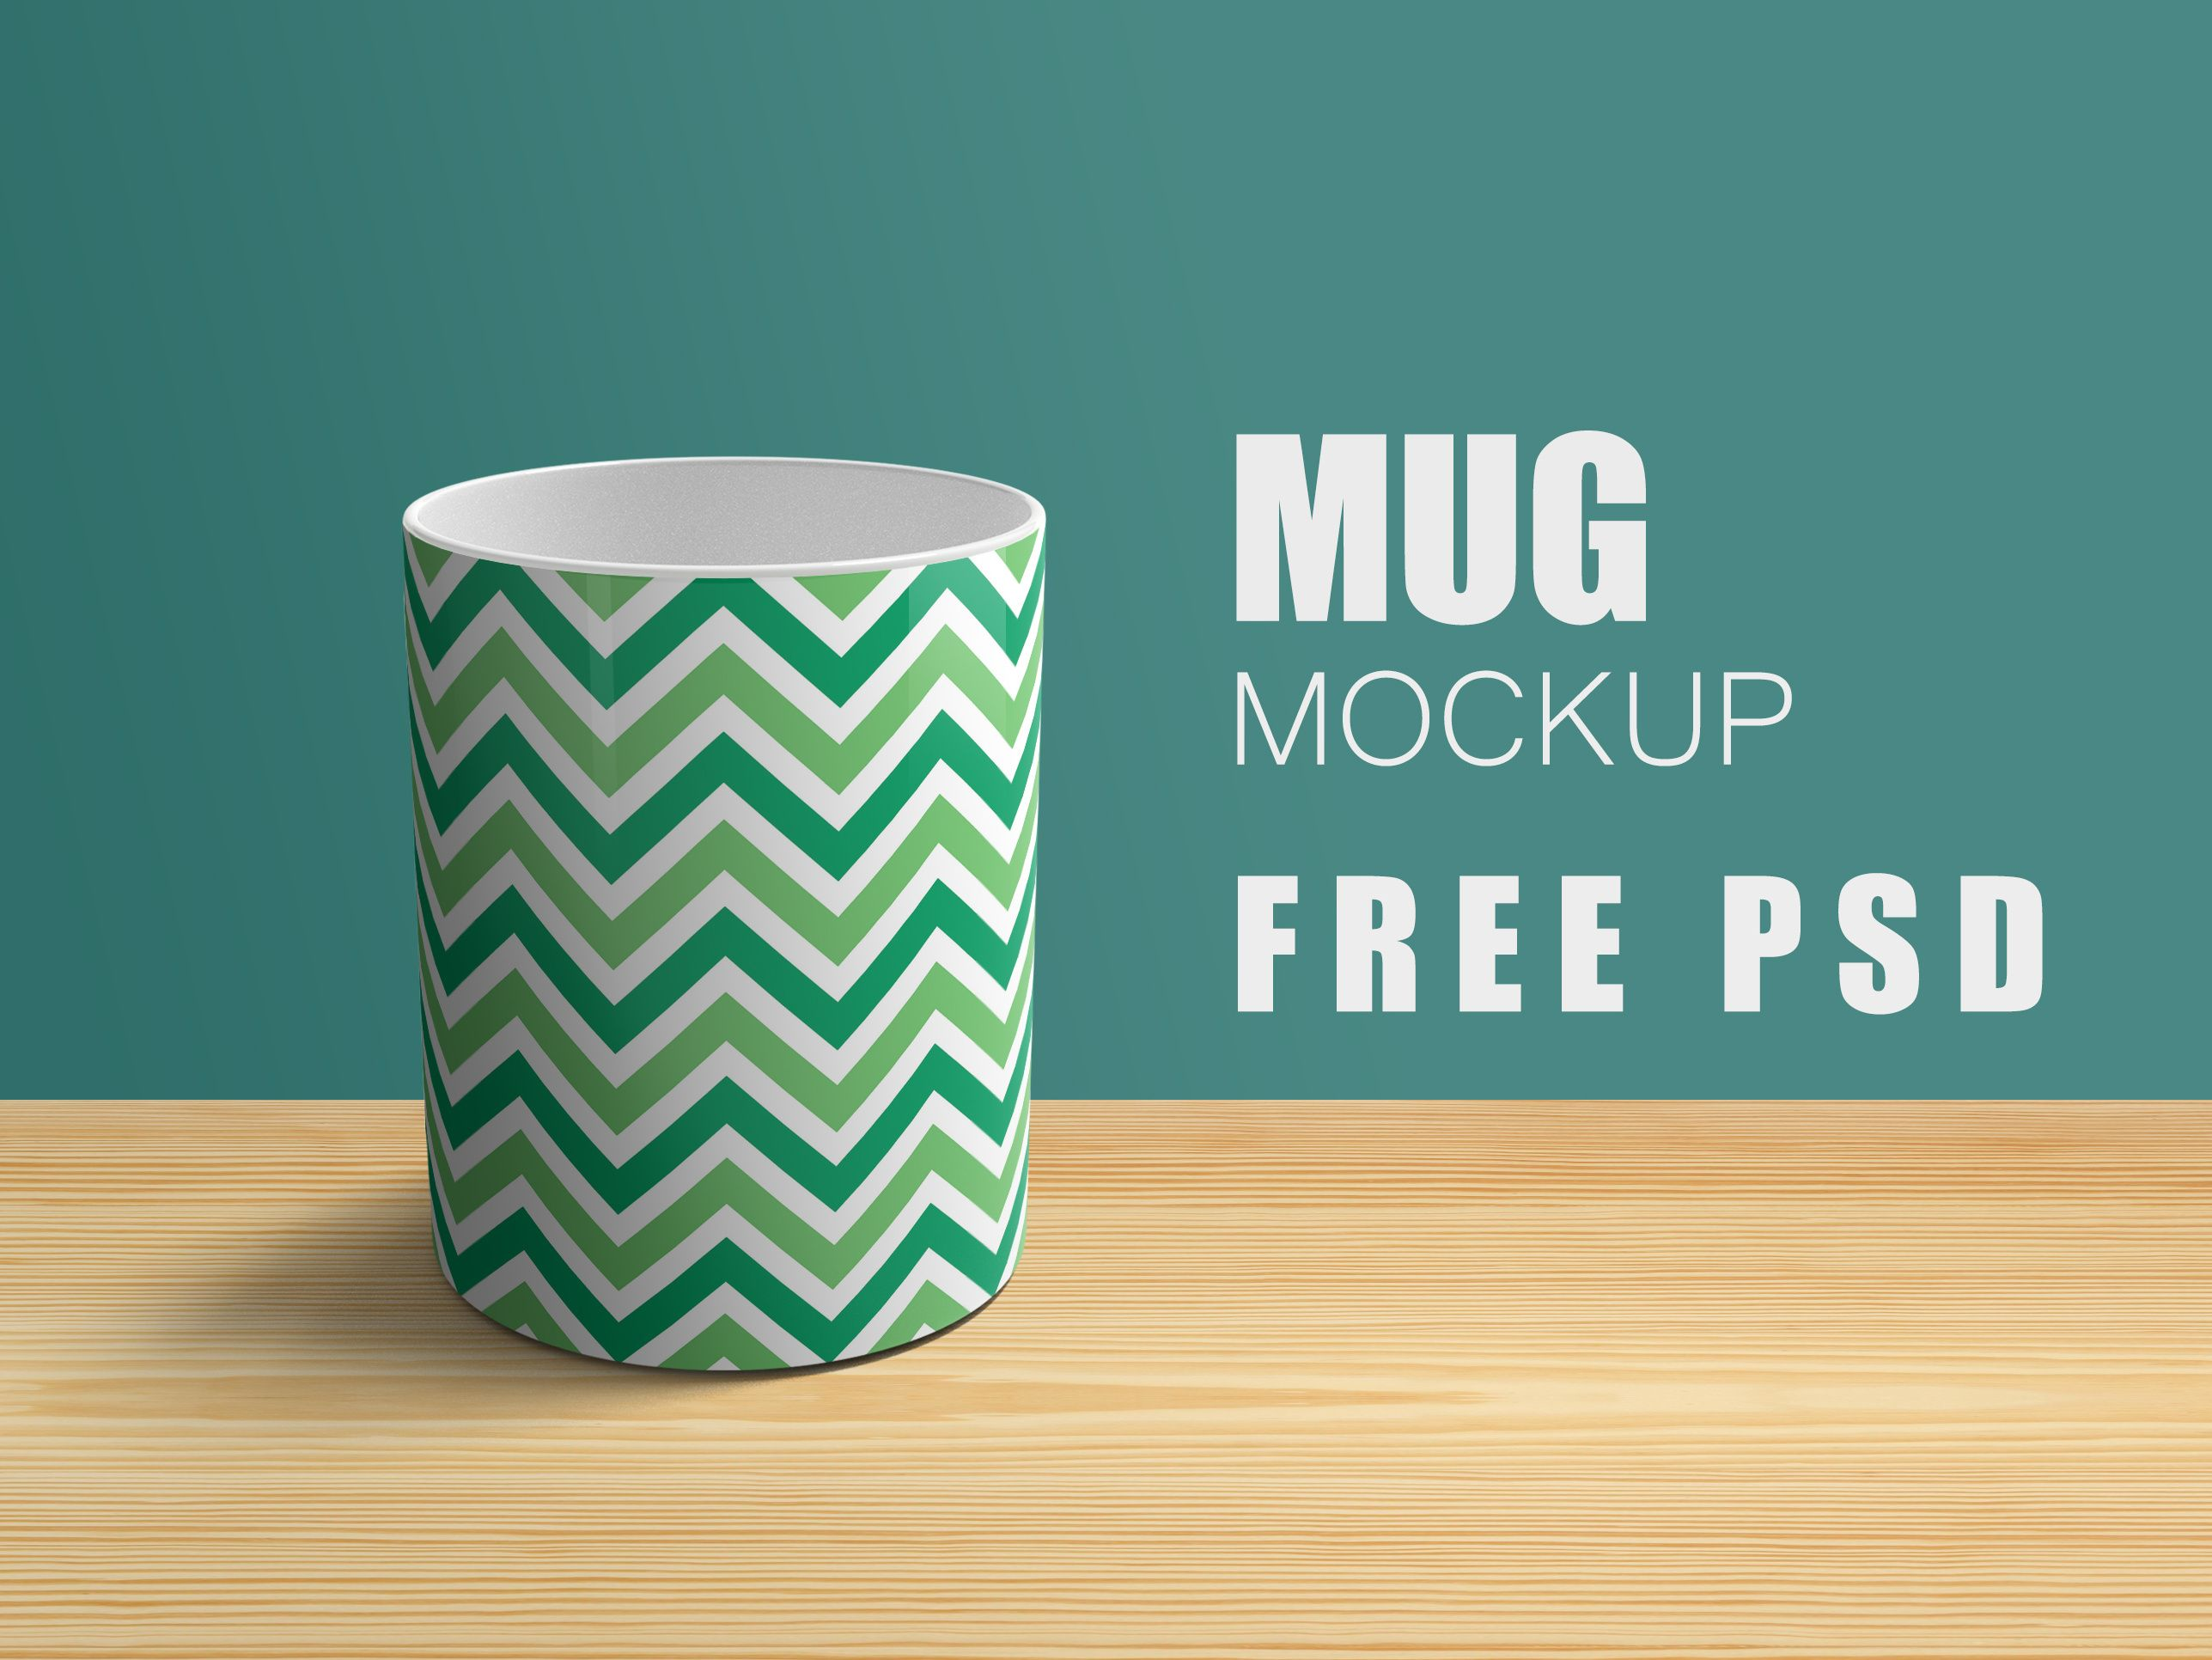 Free Full Wrap Mug Mockup Mockup Free Psd Free Mockup Mugs